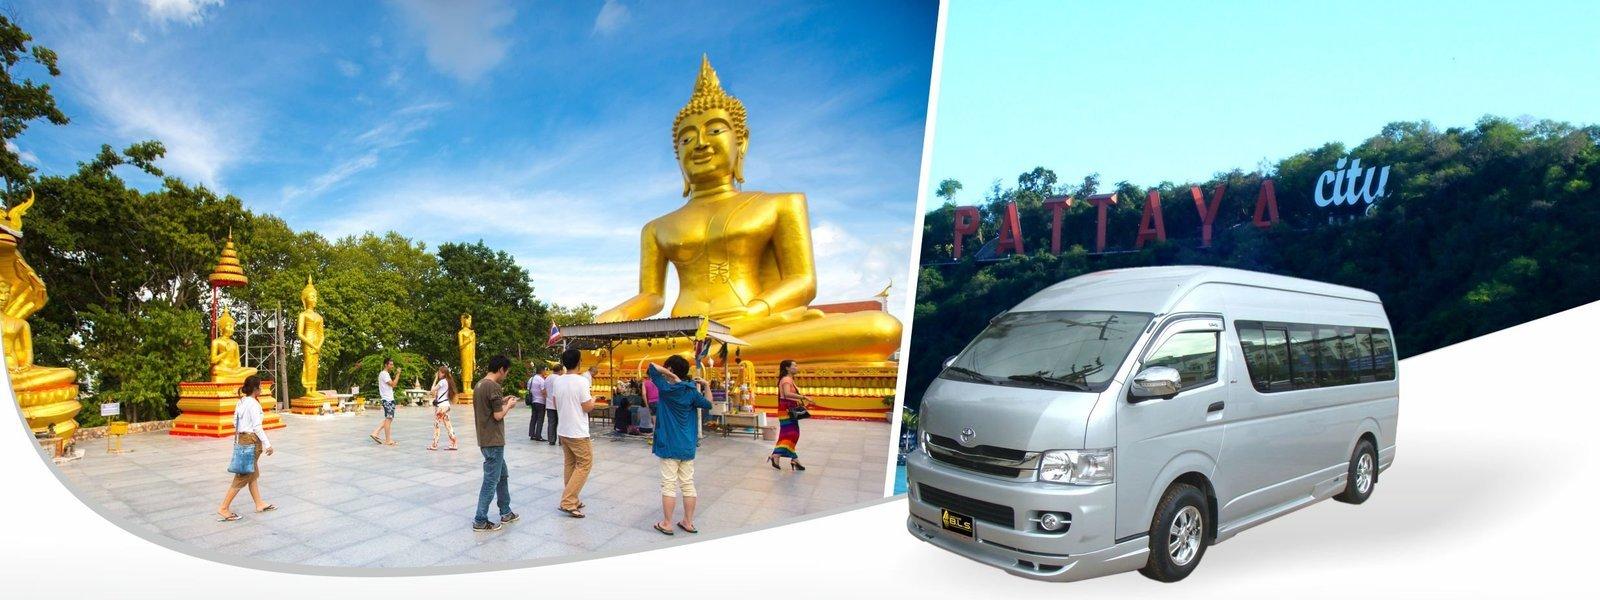 Swarnabhumi Airport To Pattaya Hotel Transfer (BY VAN) PRIVATE - Tour